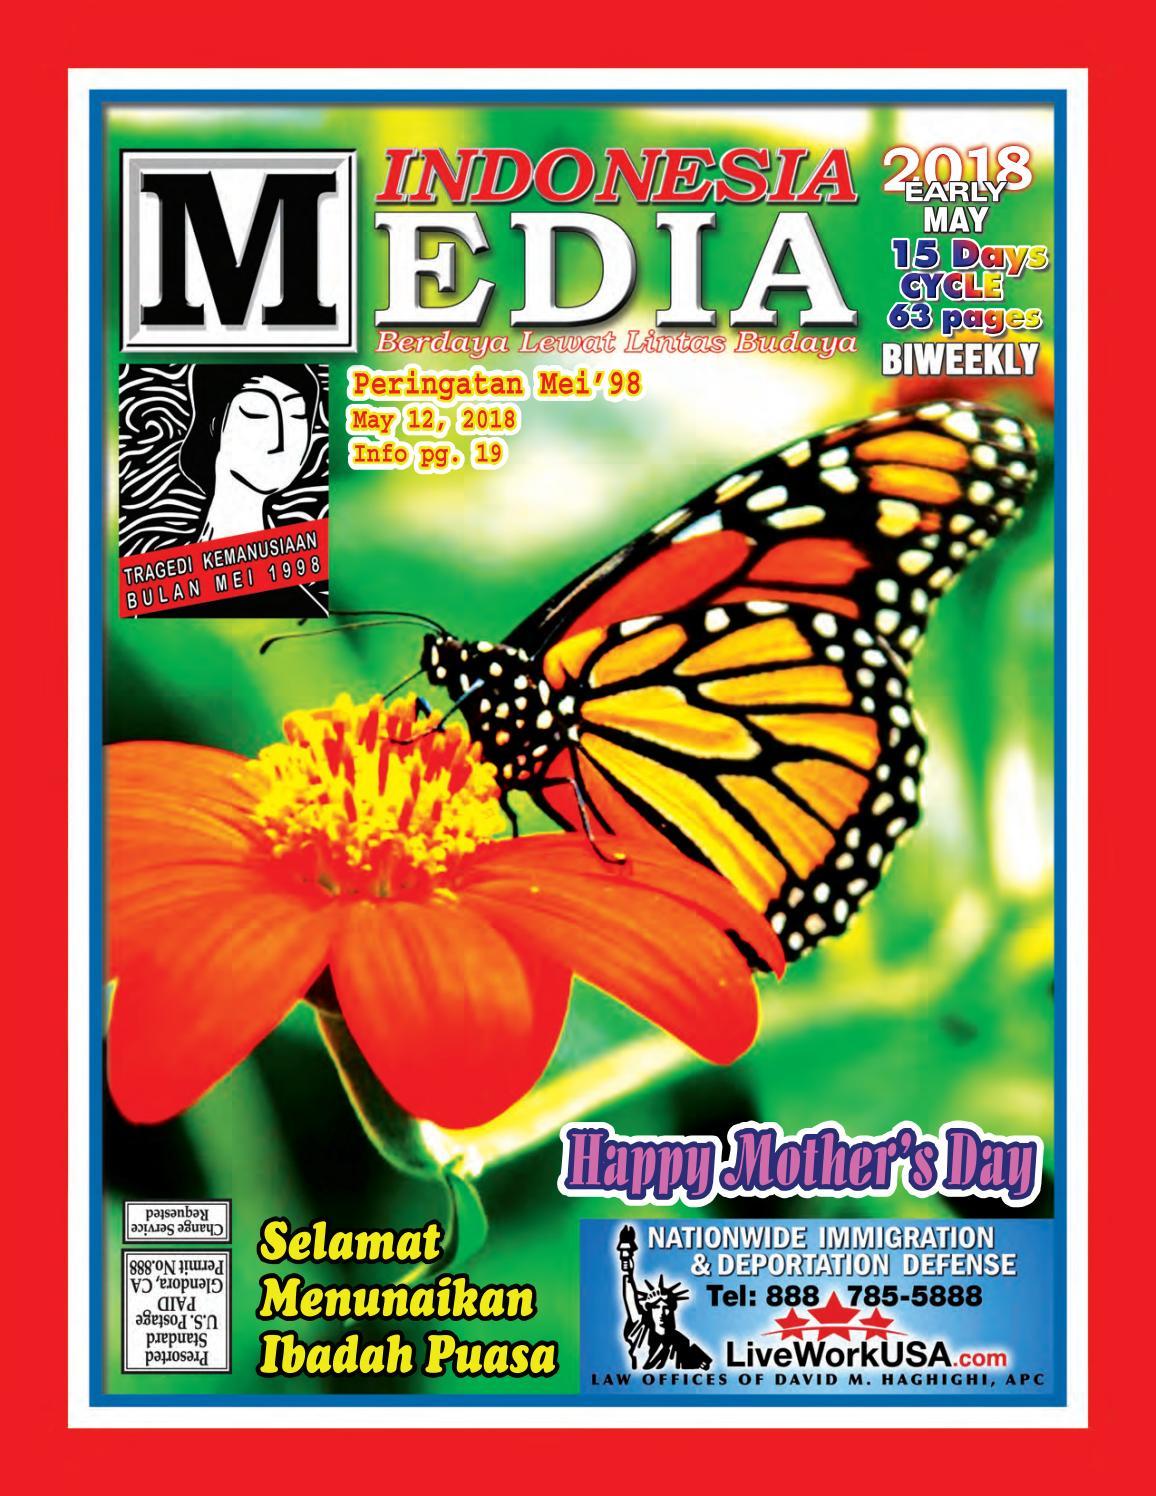 Indonesia Media Issue Early May 2018 By Issuu Produk Ukm Bumn Mahkota Papua Bin Syowi